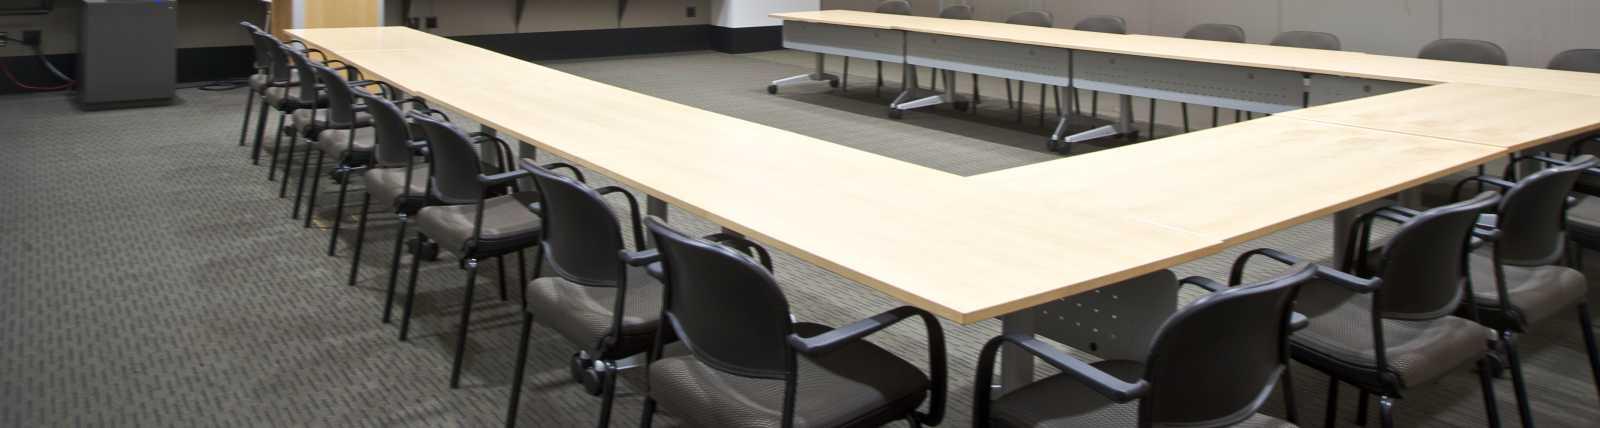 Beijing Conference Room in a U-shape